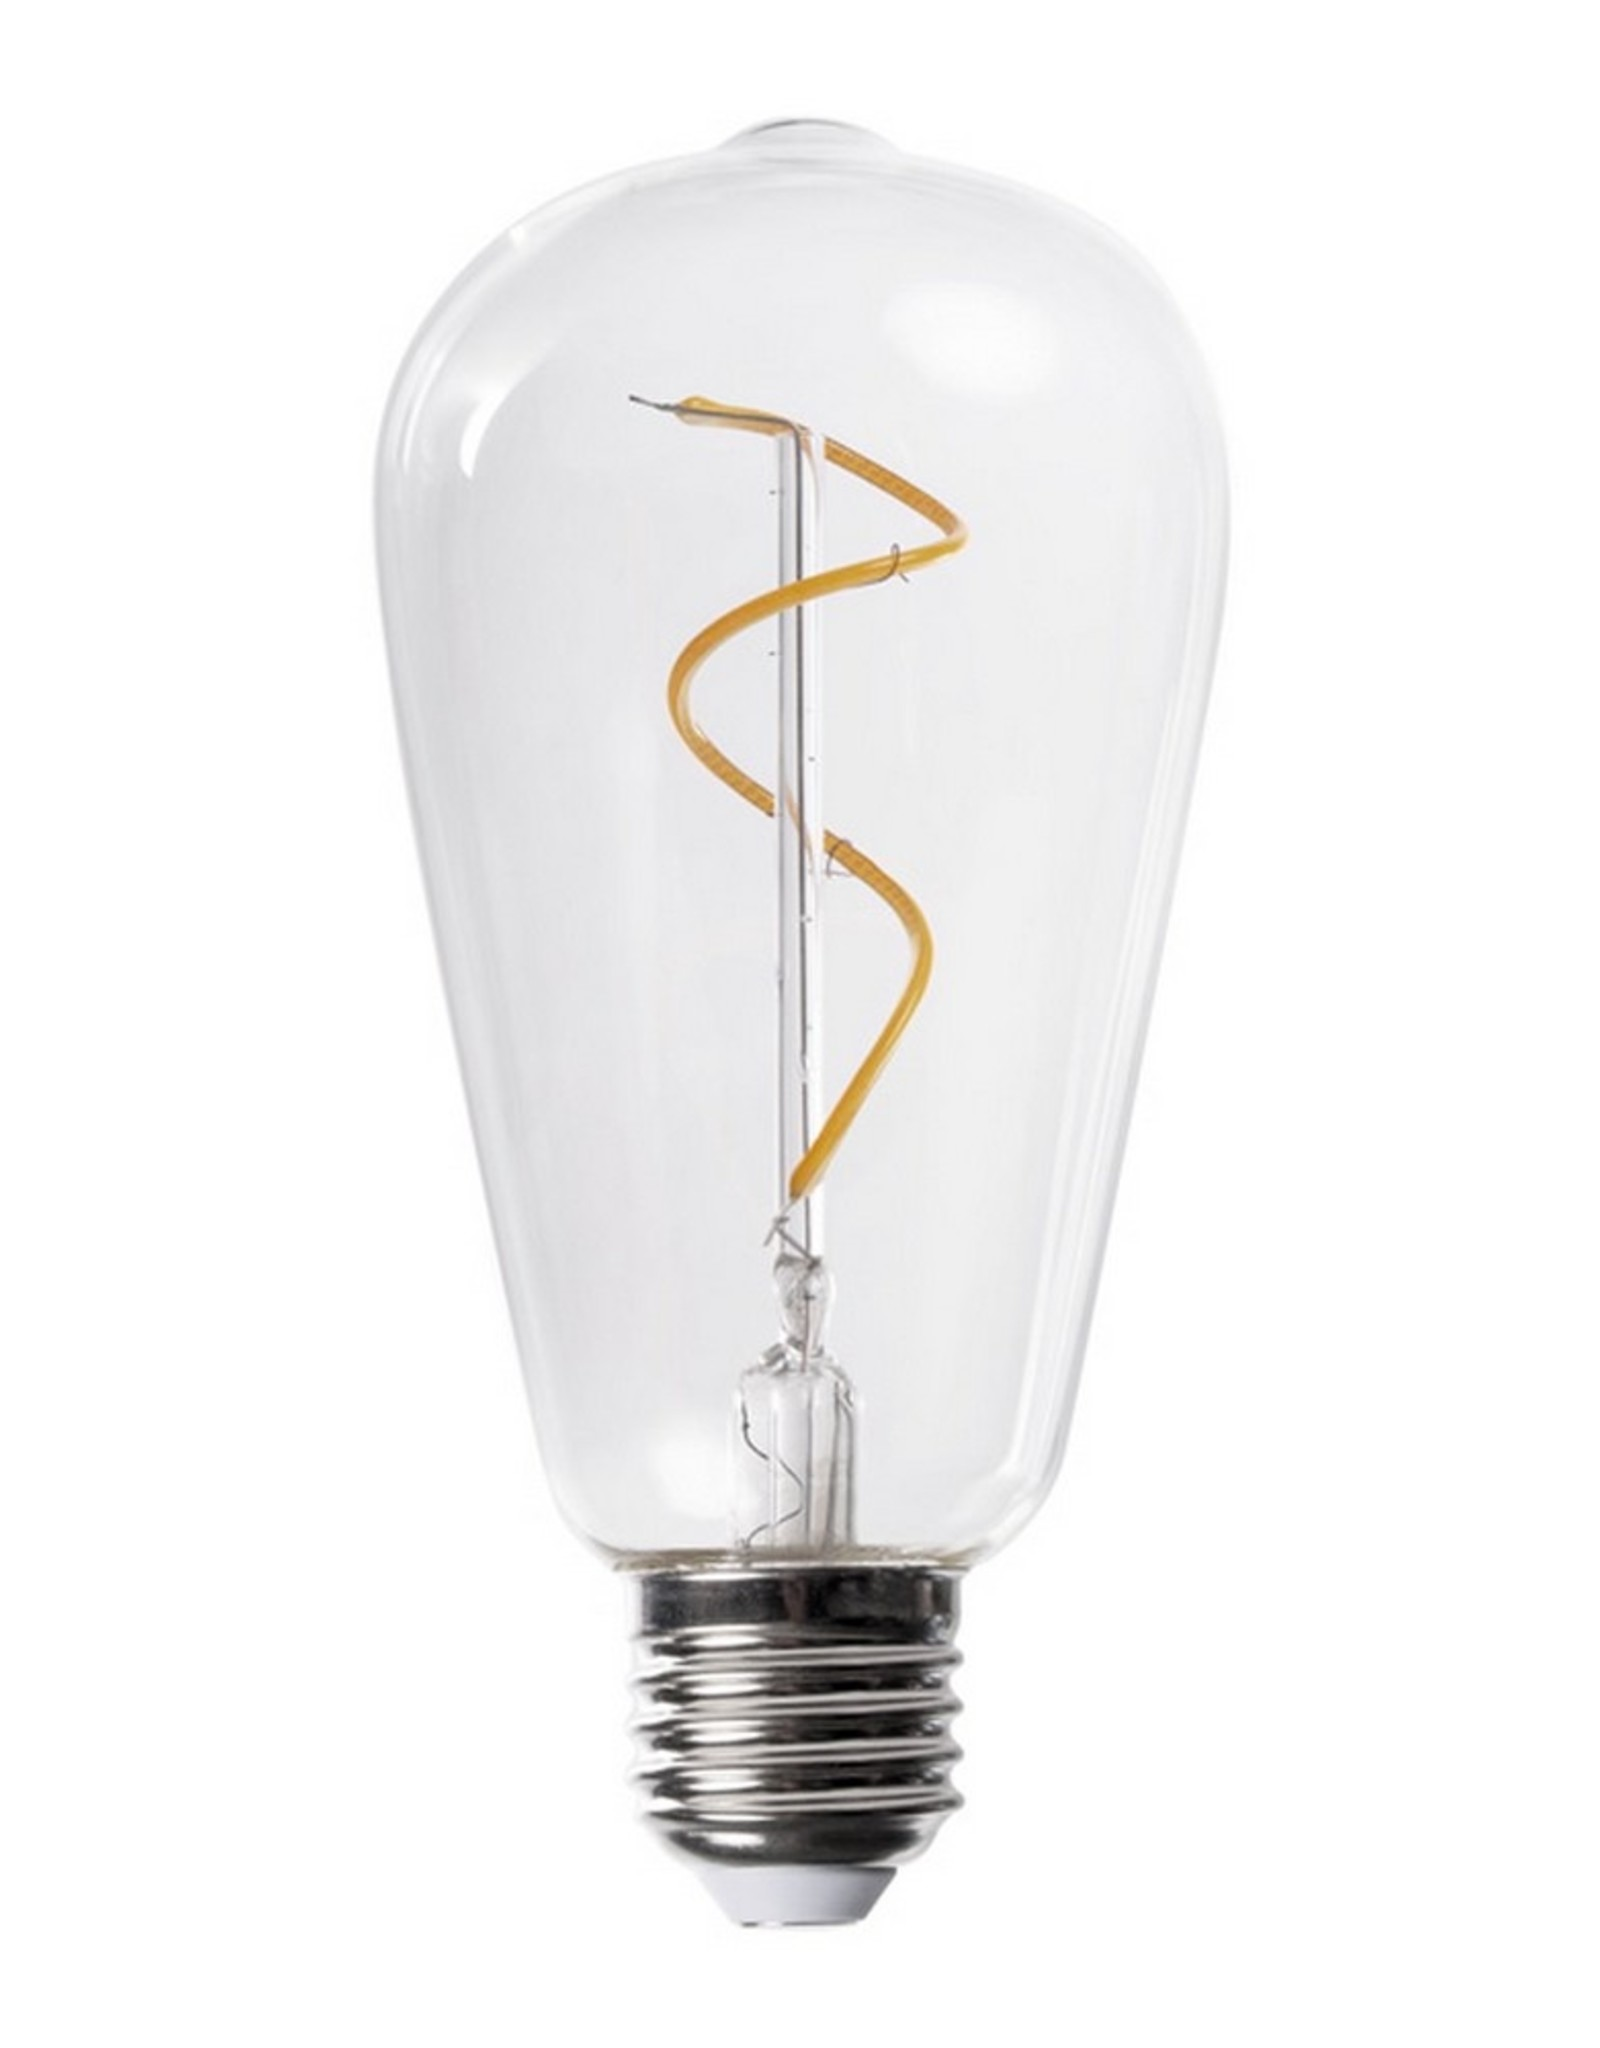 Humble Humble One Tafellamp Gold